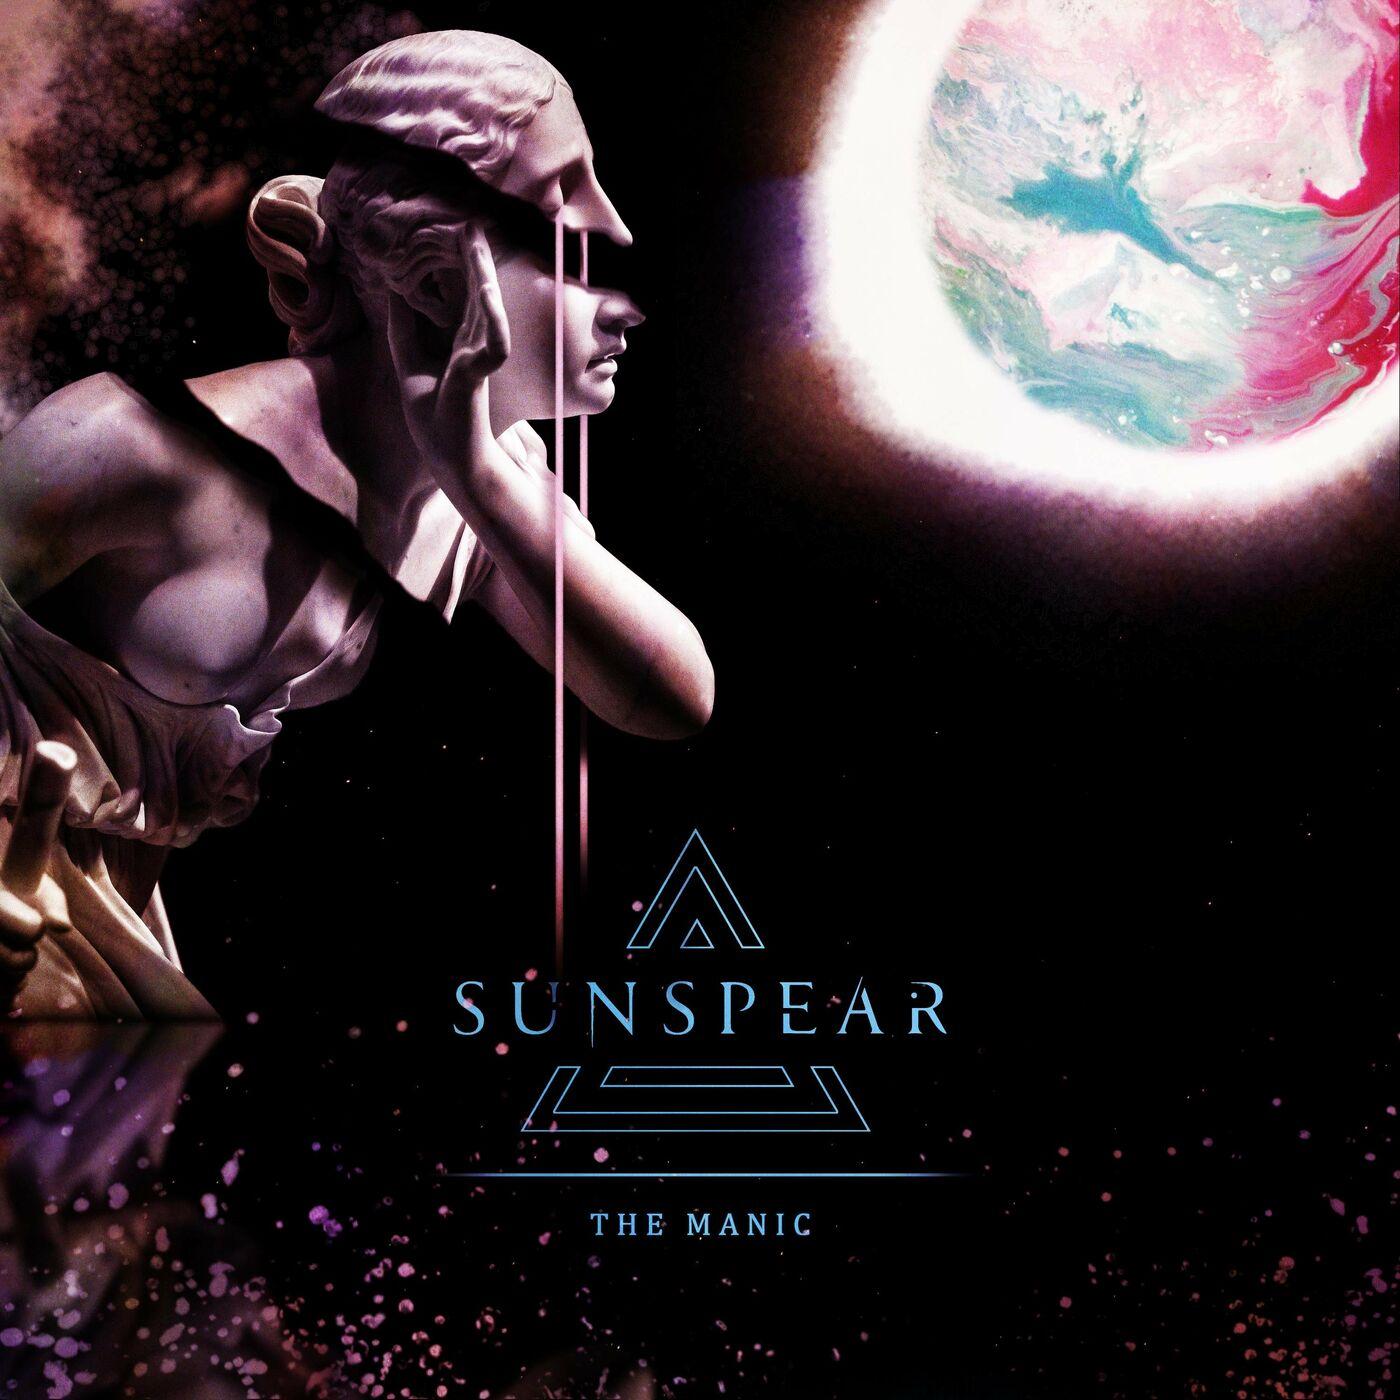 Sunspear - The Manic [single] (2020)